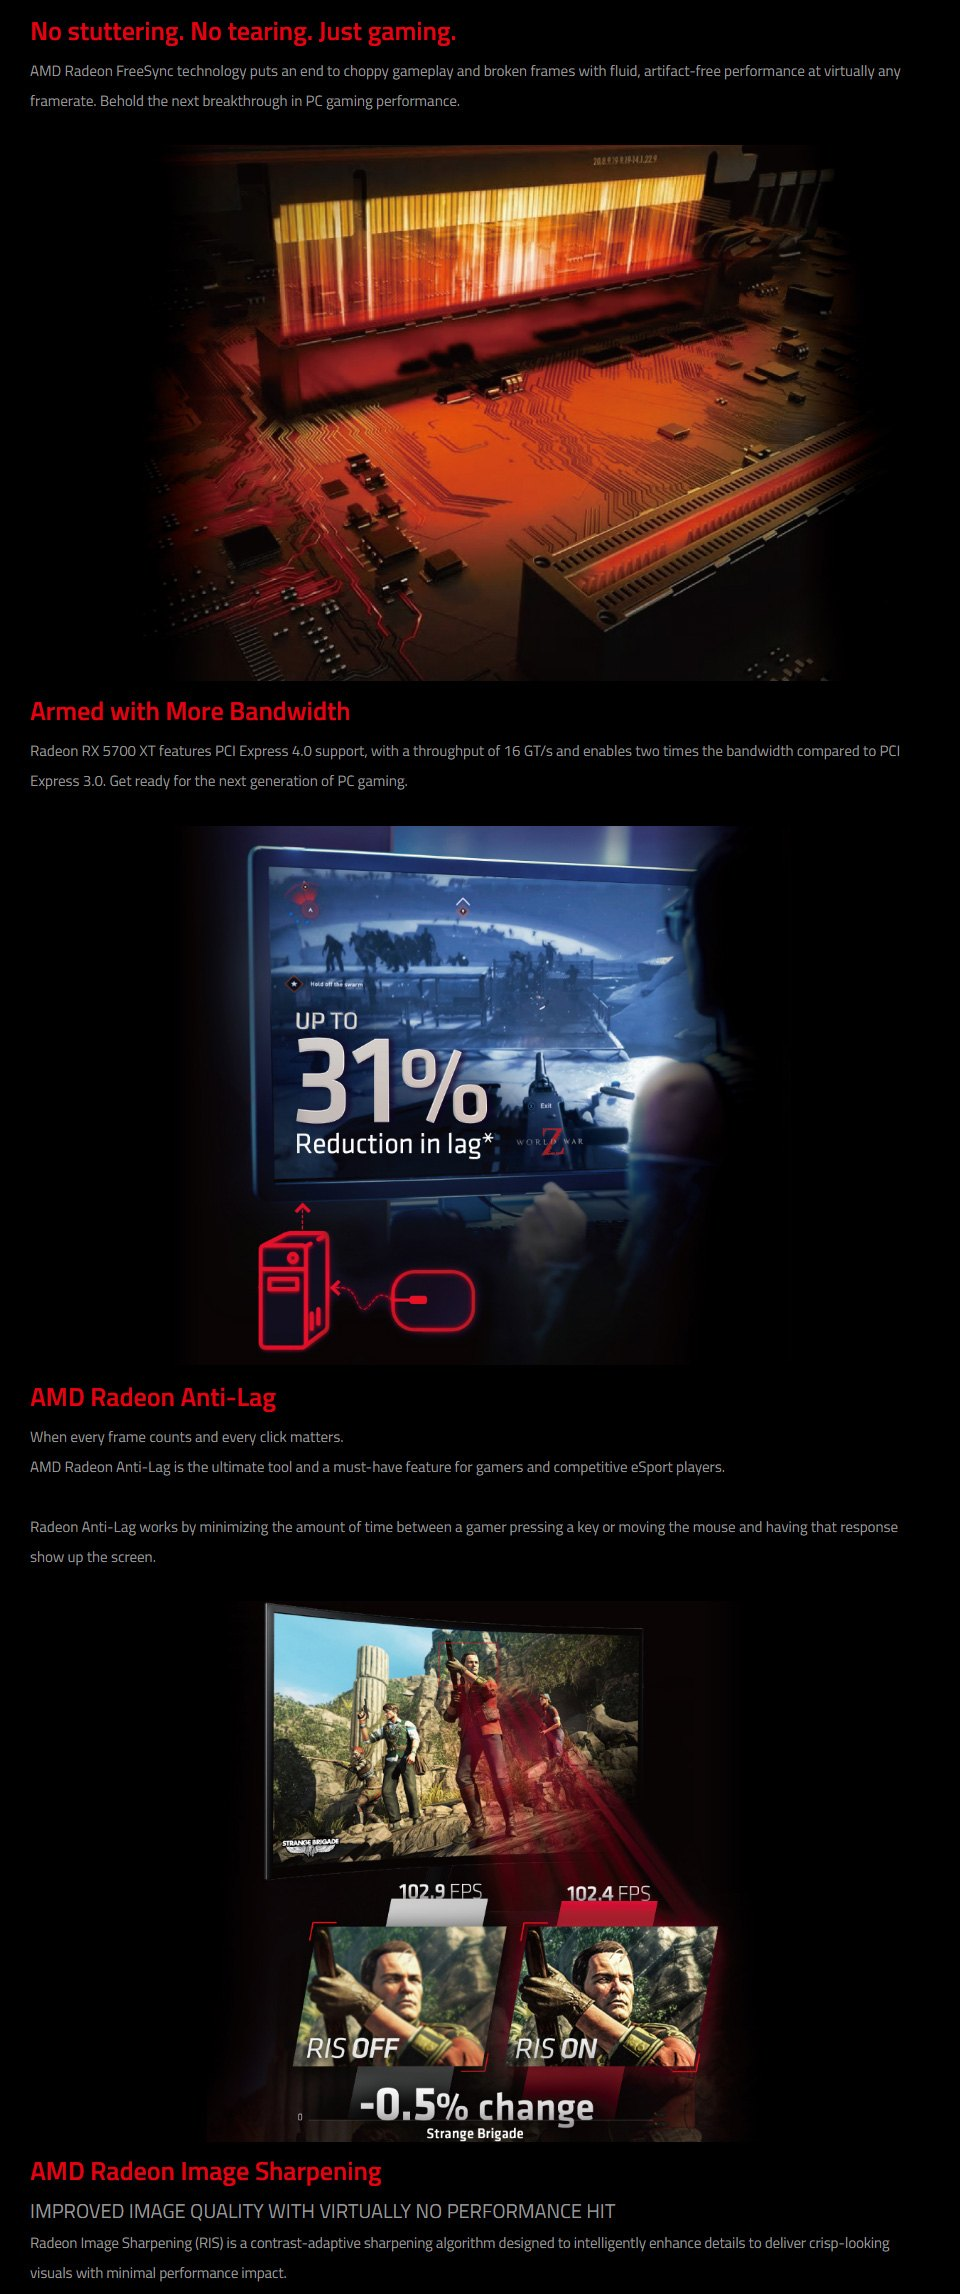 PowerColor Radeon RX 5700 XT 8GB features 3